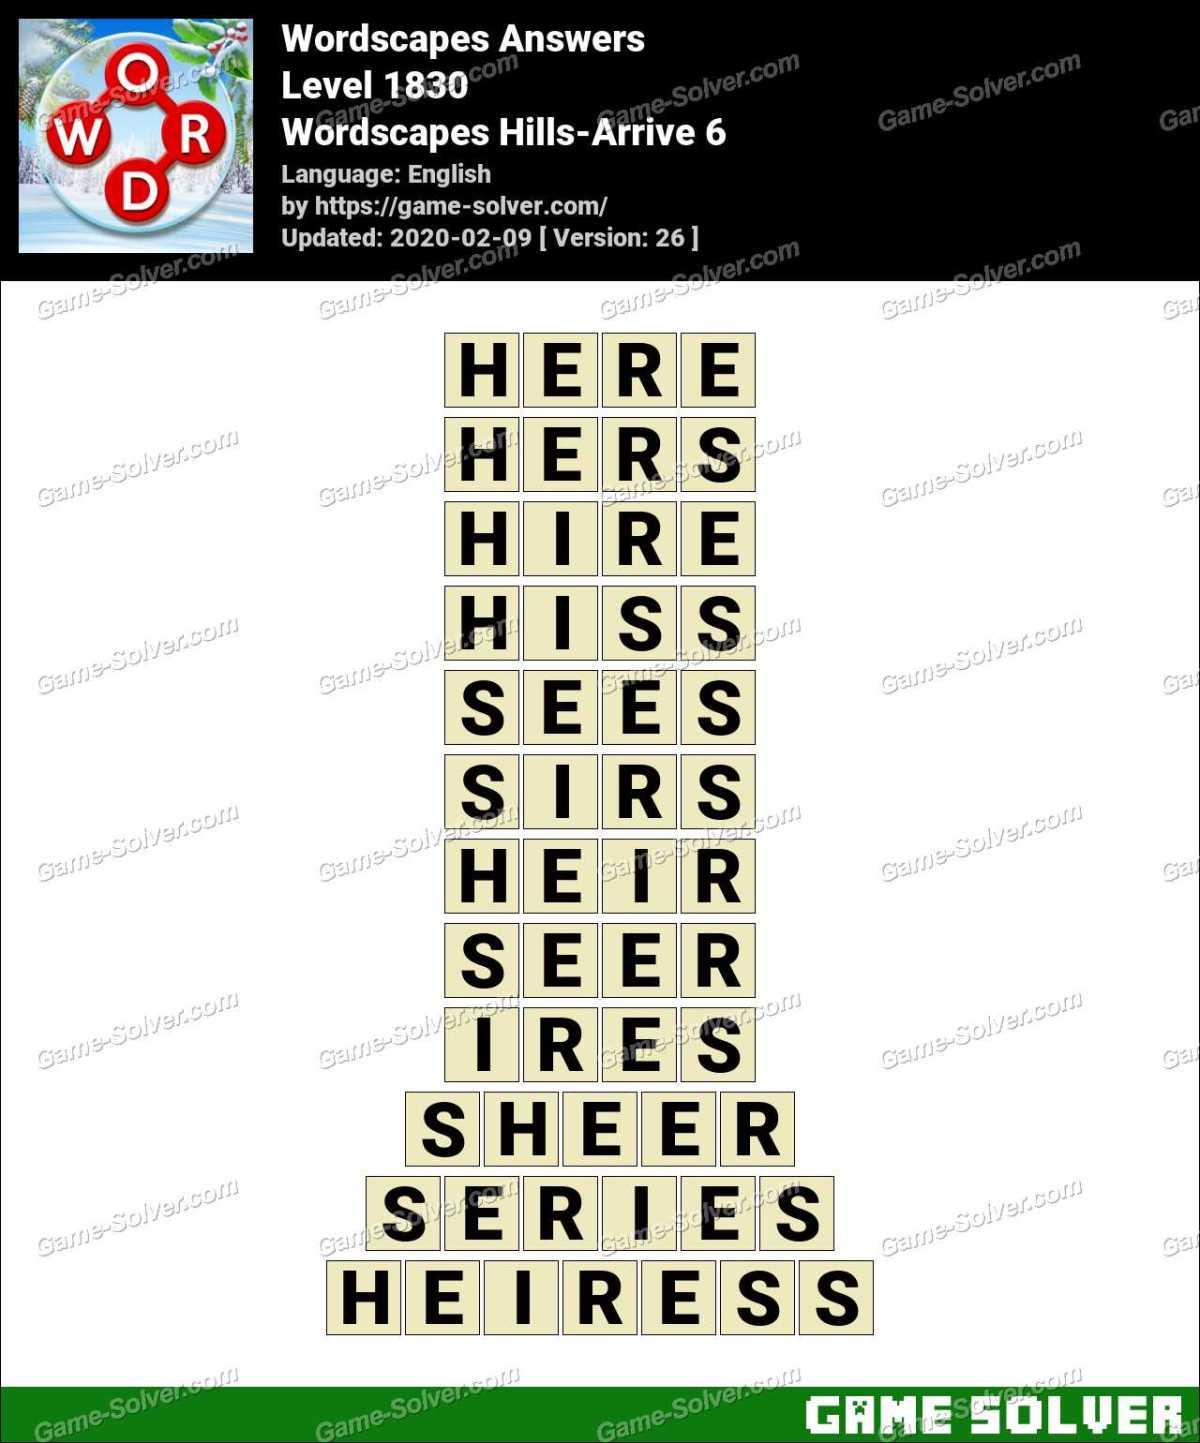 Wordscapes Hills-Arrive 6 Answers